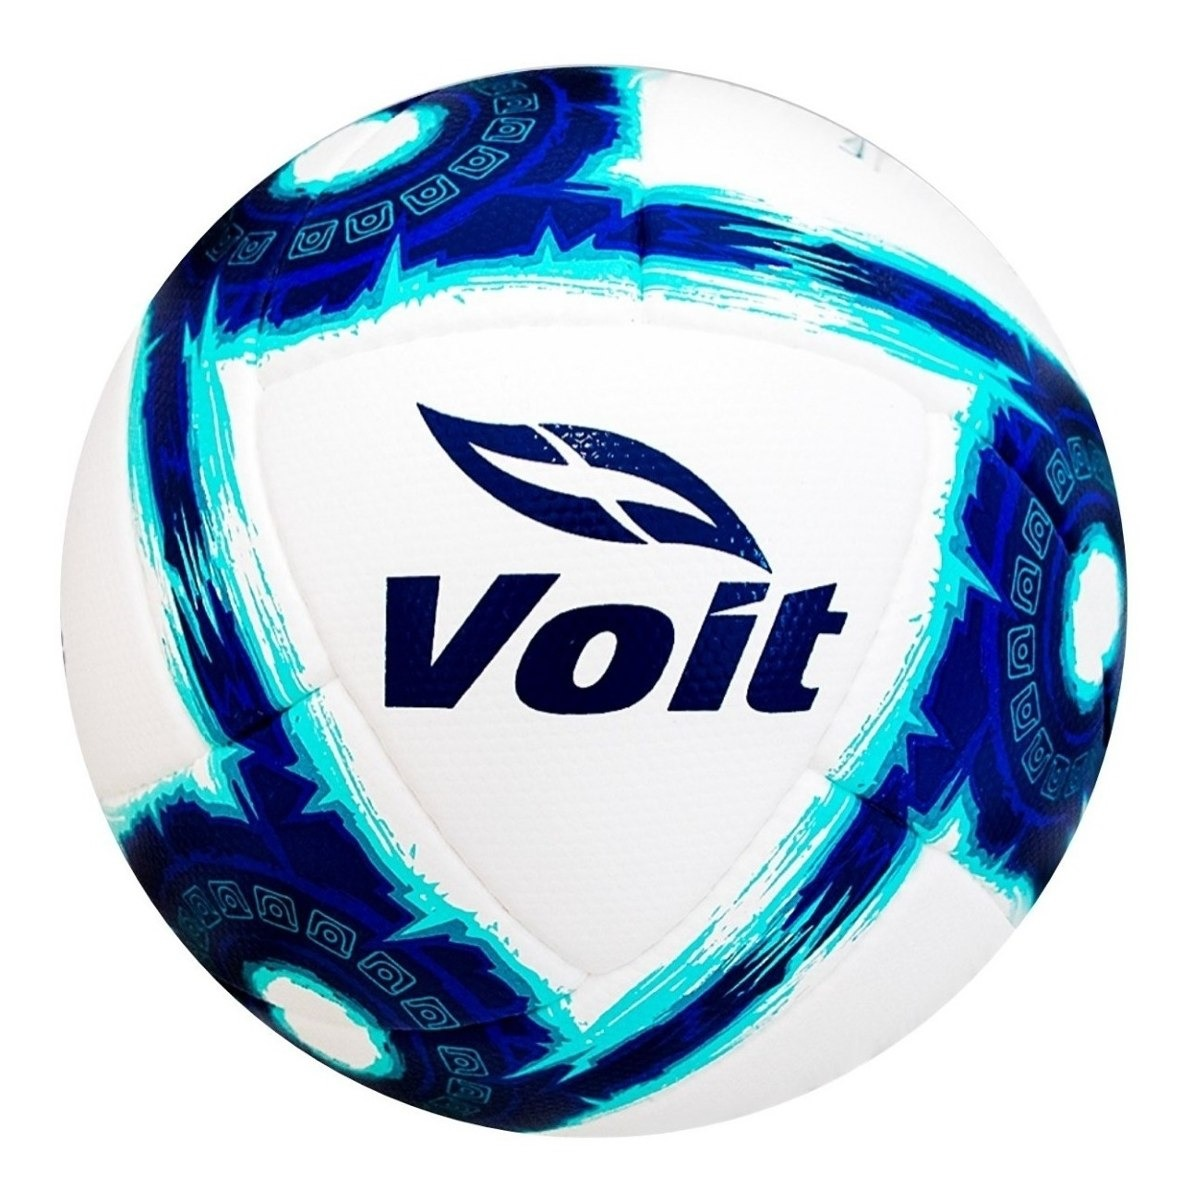 Balon Voit Loxus Profesional Liga Mx 2019 No.5 Calidad